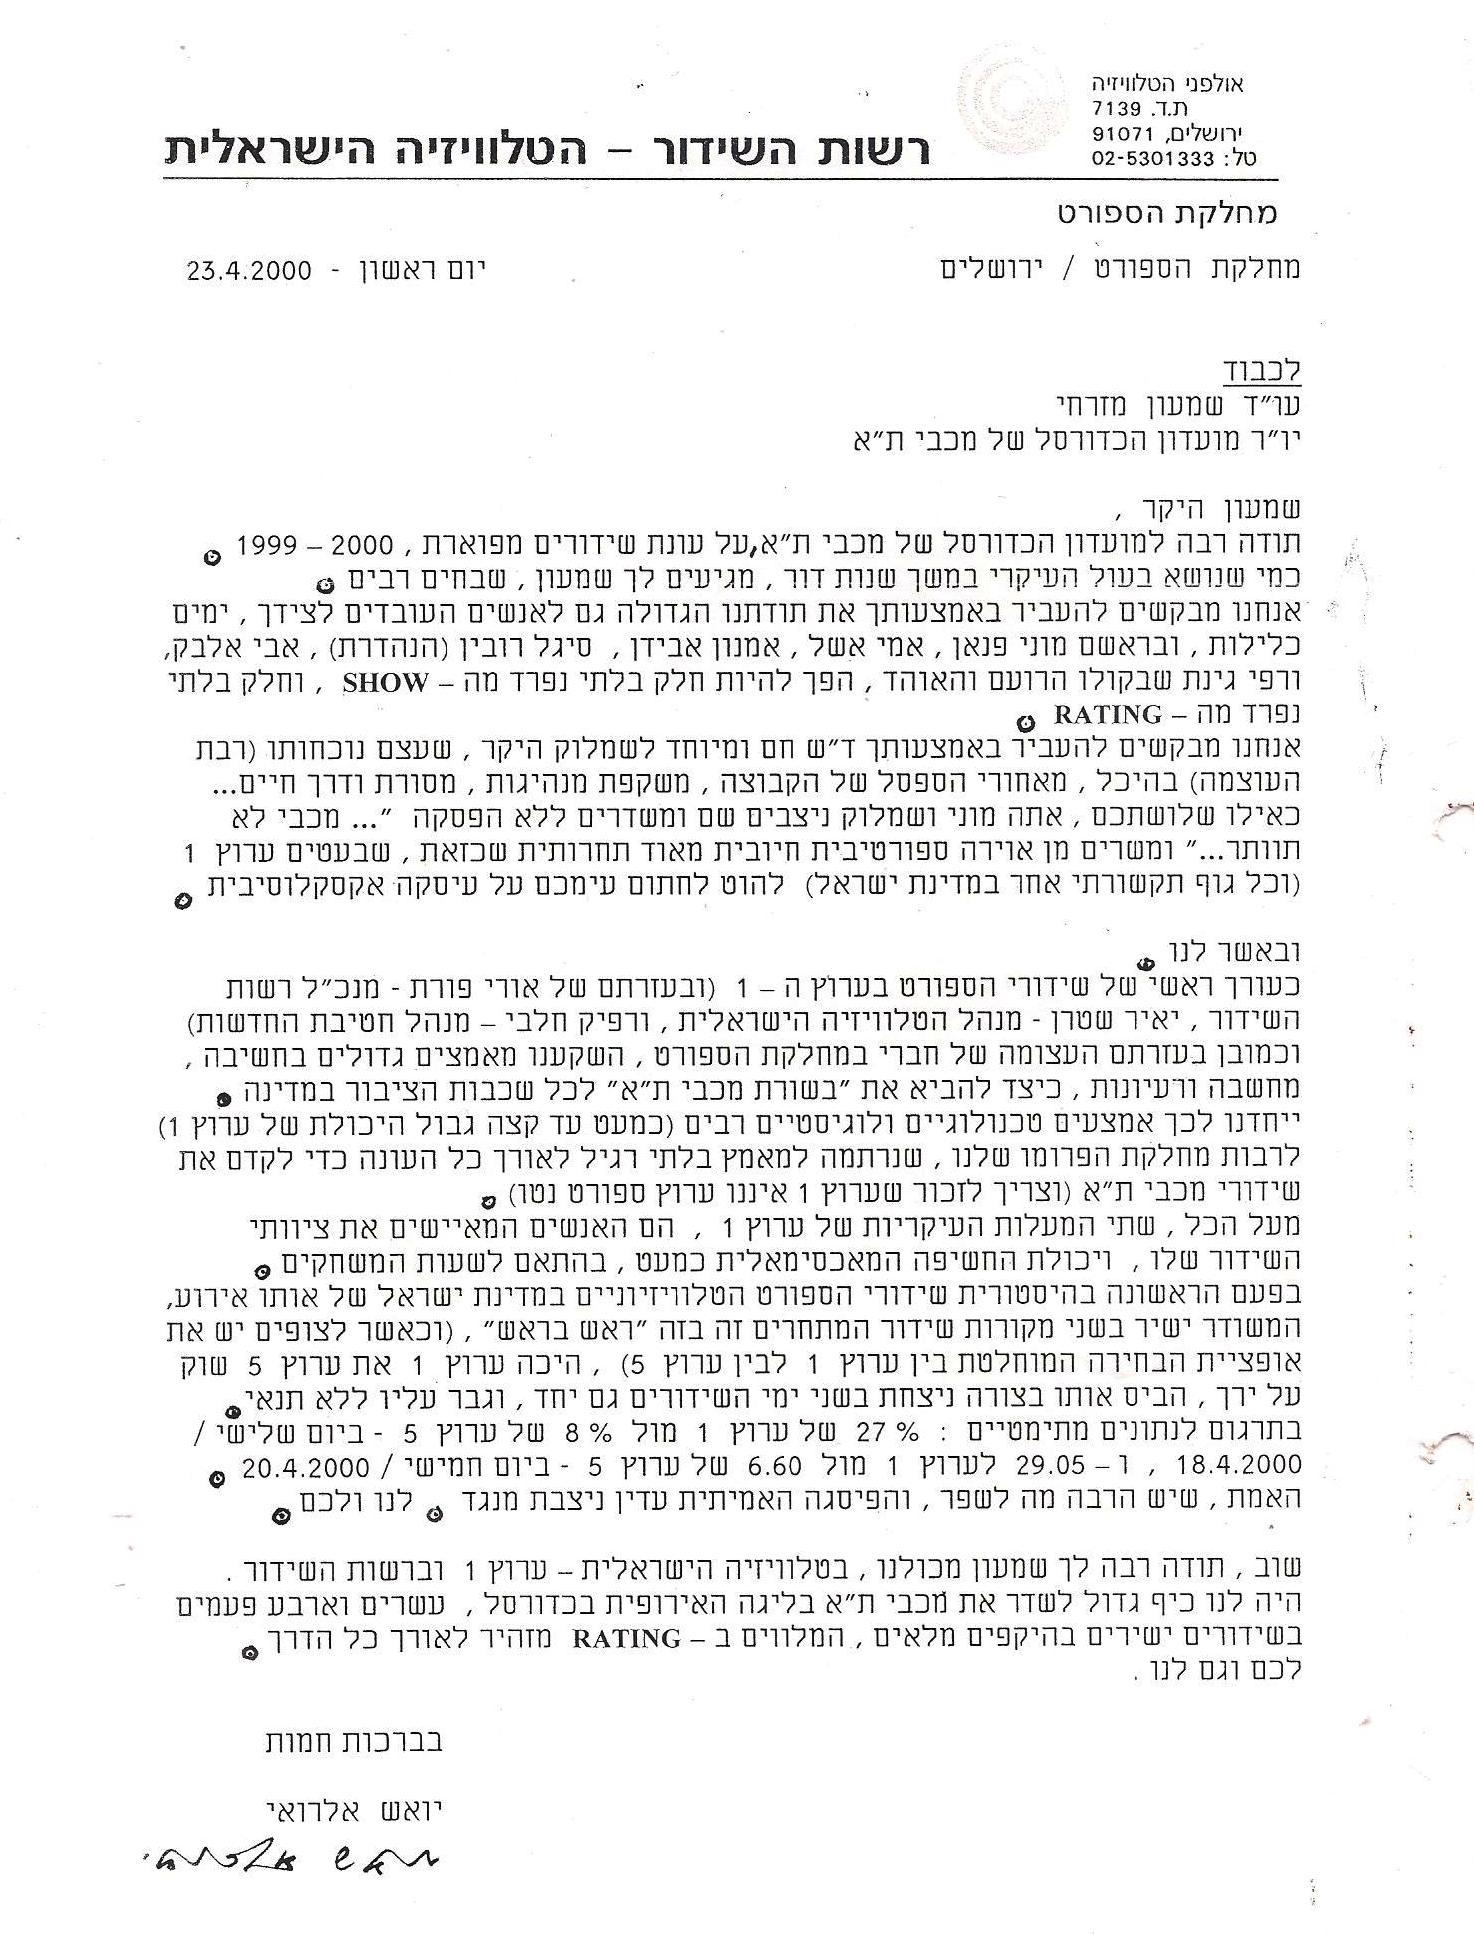 23.4.2000 shimon mizrahi 1